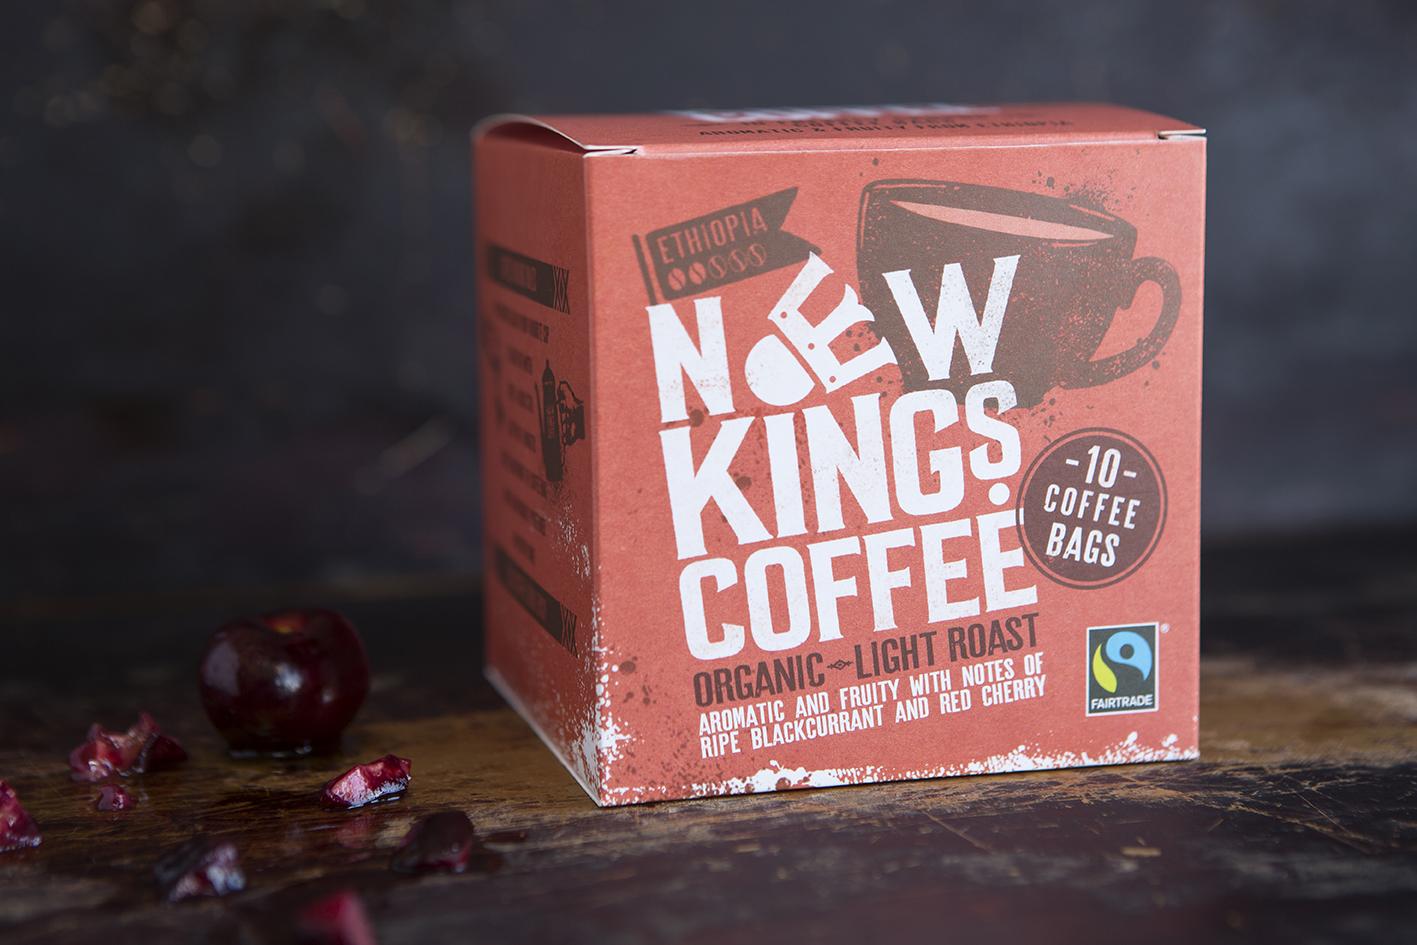 New-Kings-Coffee-Bags-Fairtrade-Organic-Light-Roast-10.jpg